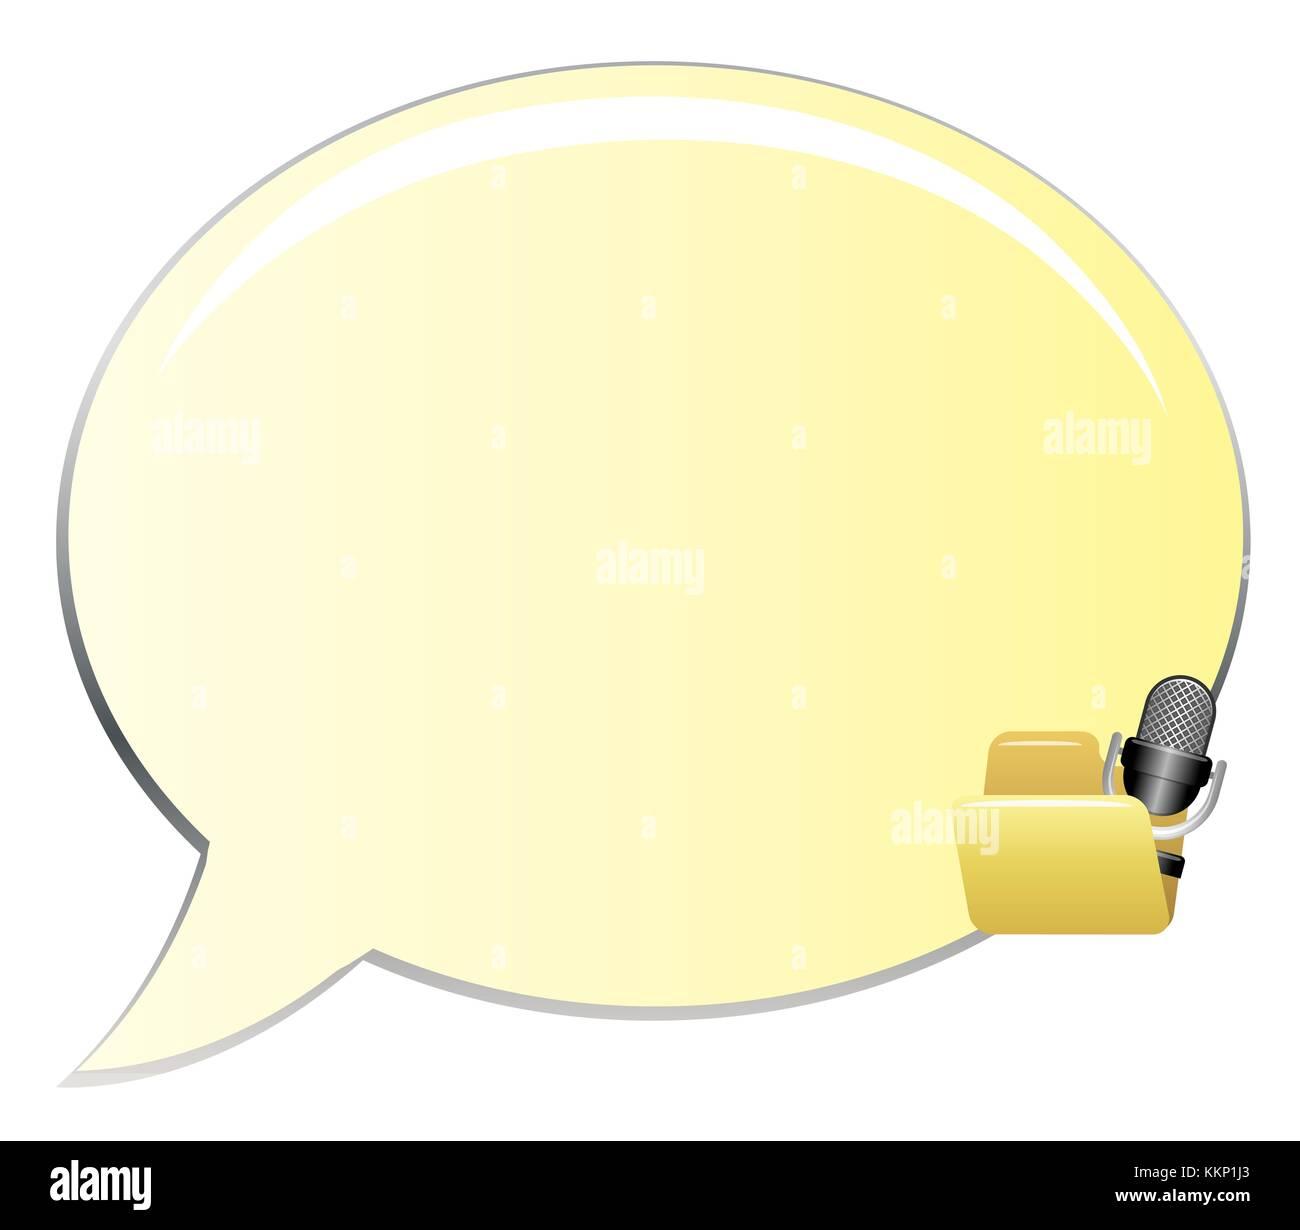 Clip art bulles jaunes Photo Stock